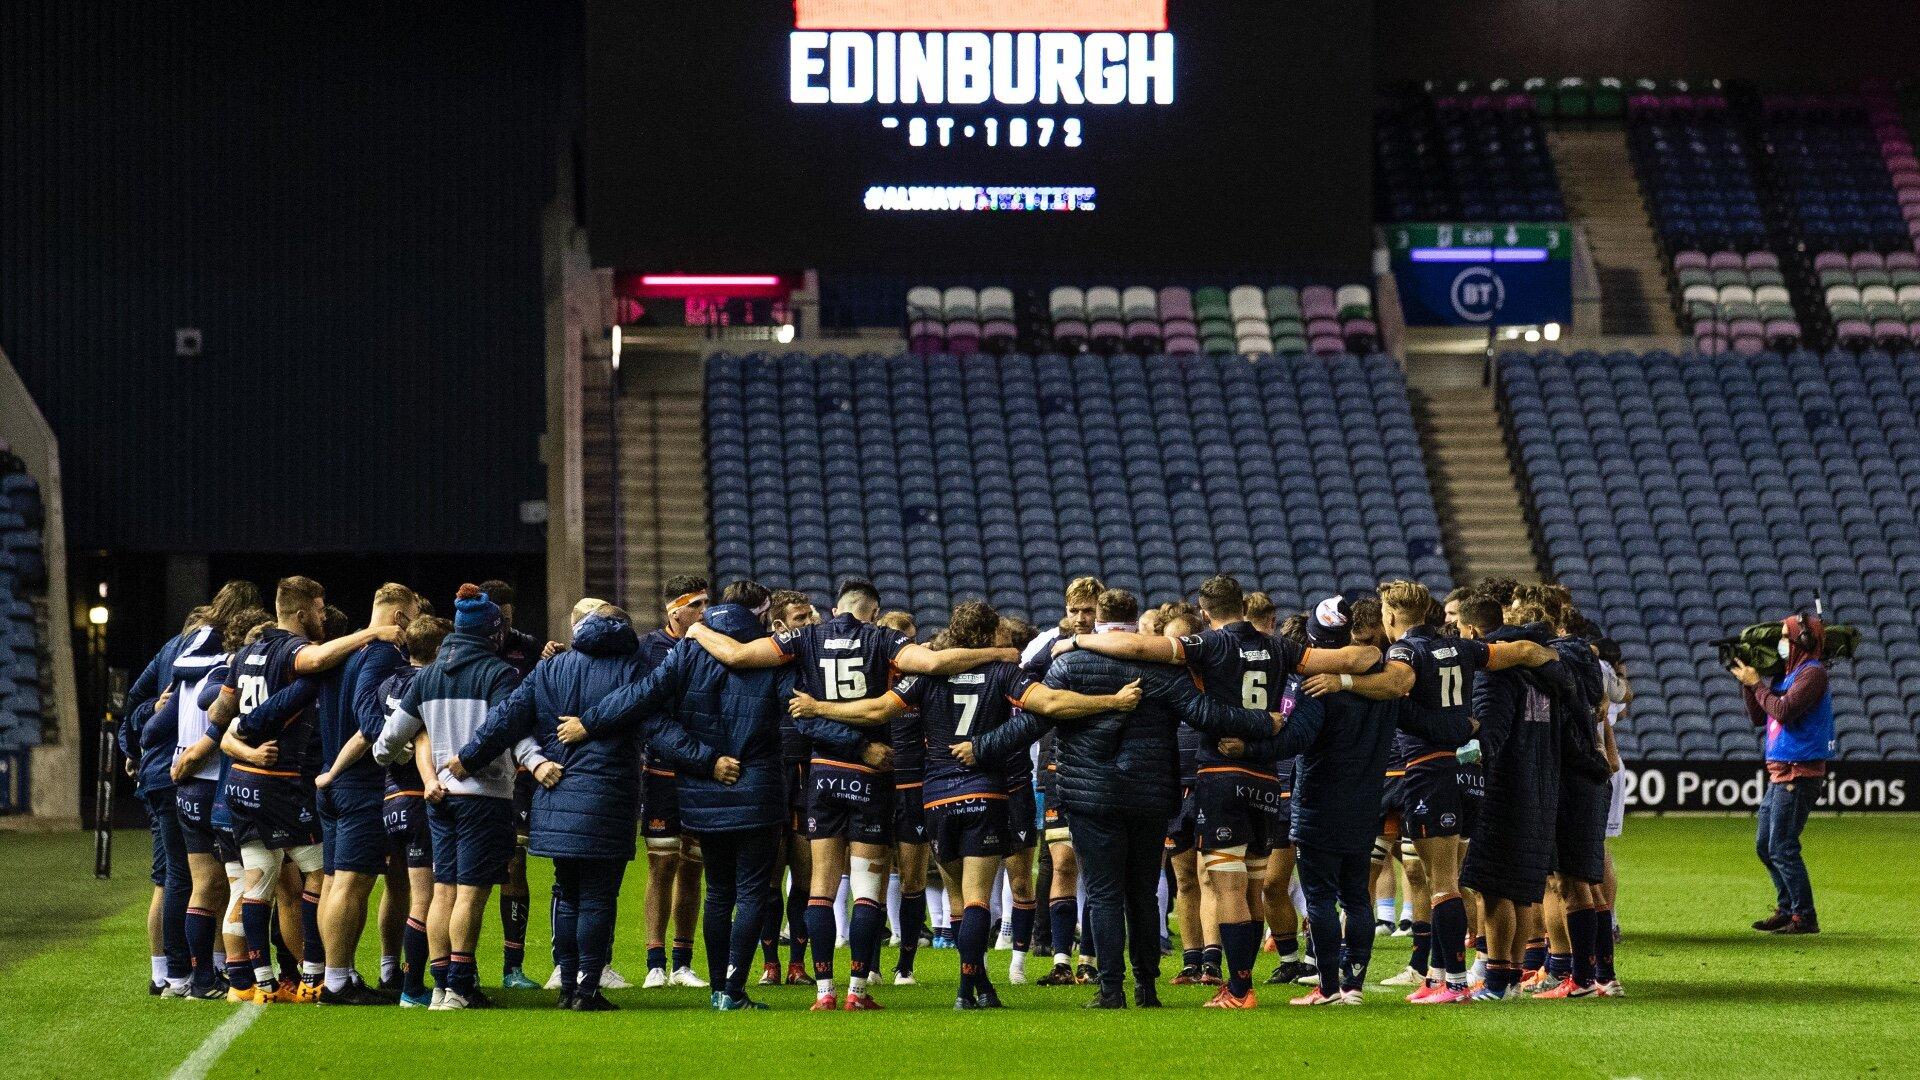 Edinburgh Ulster PRO14 semi-final